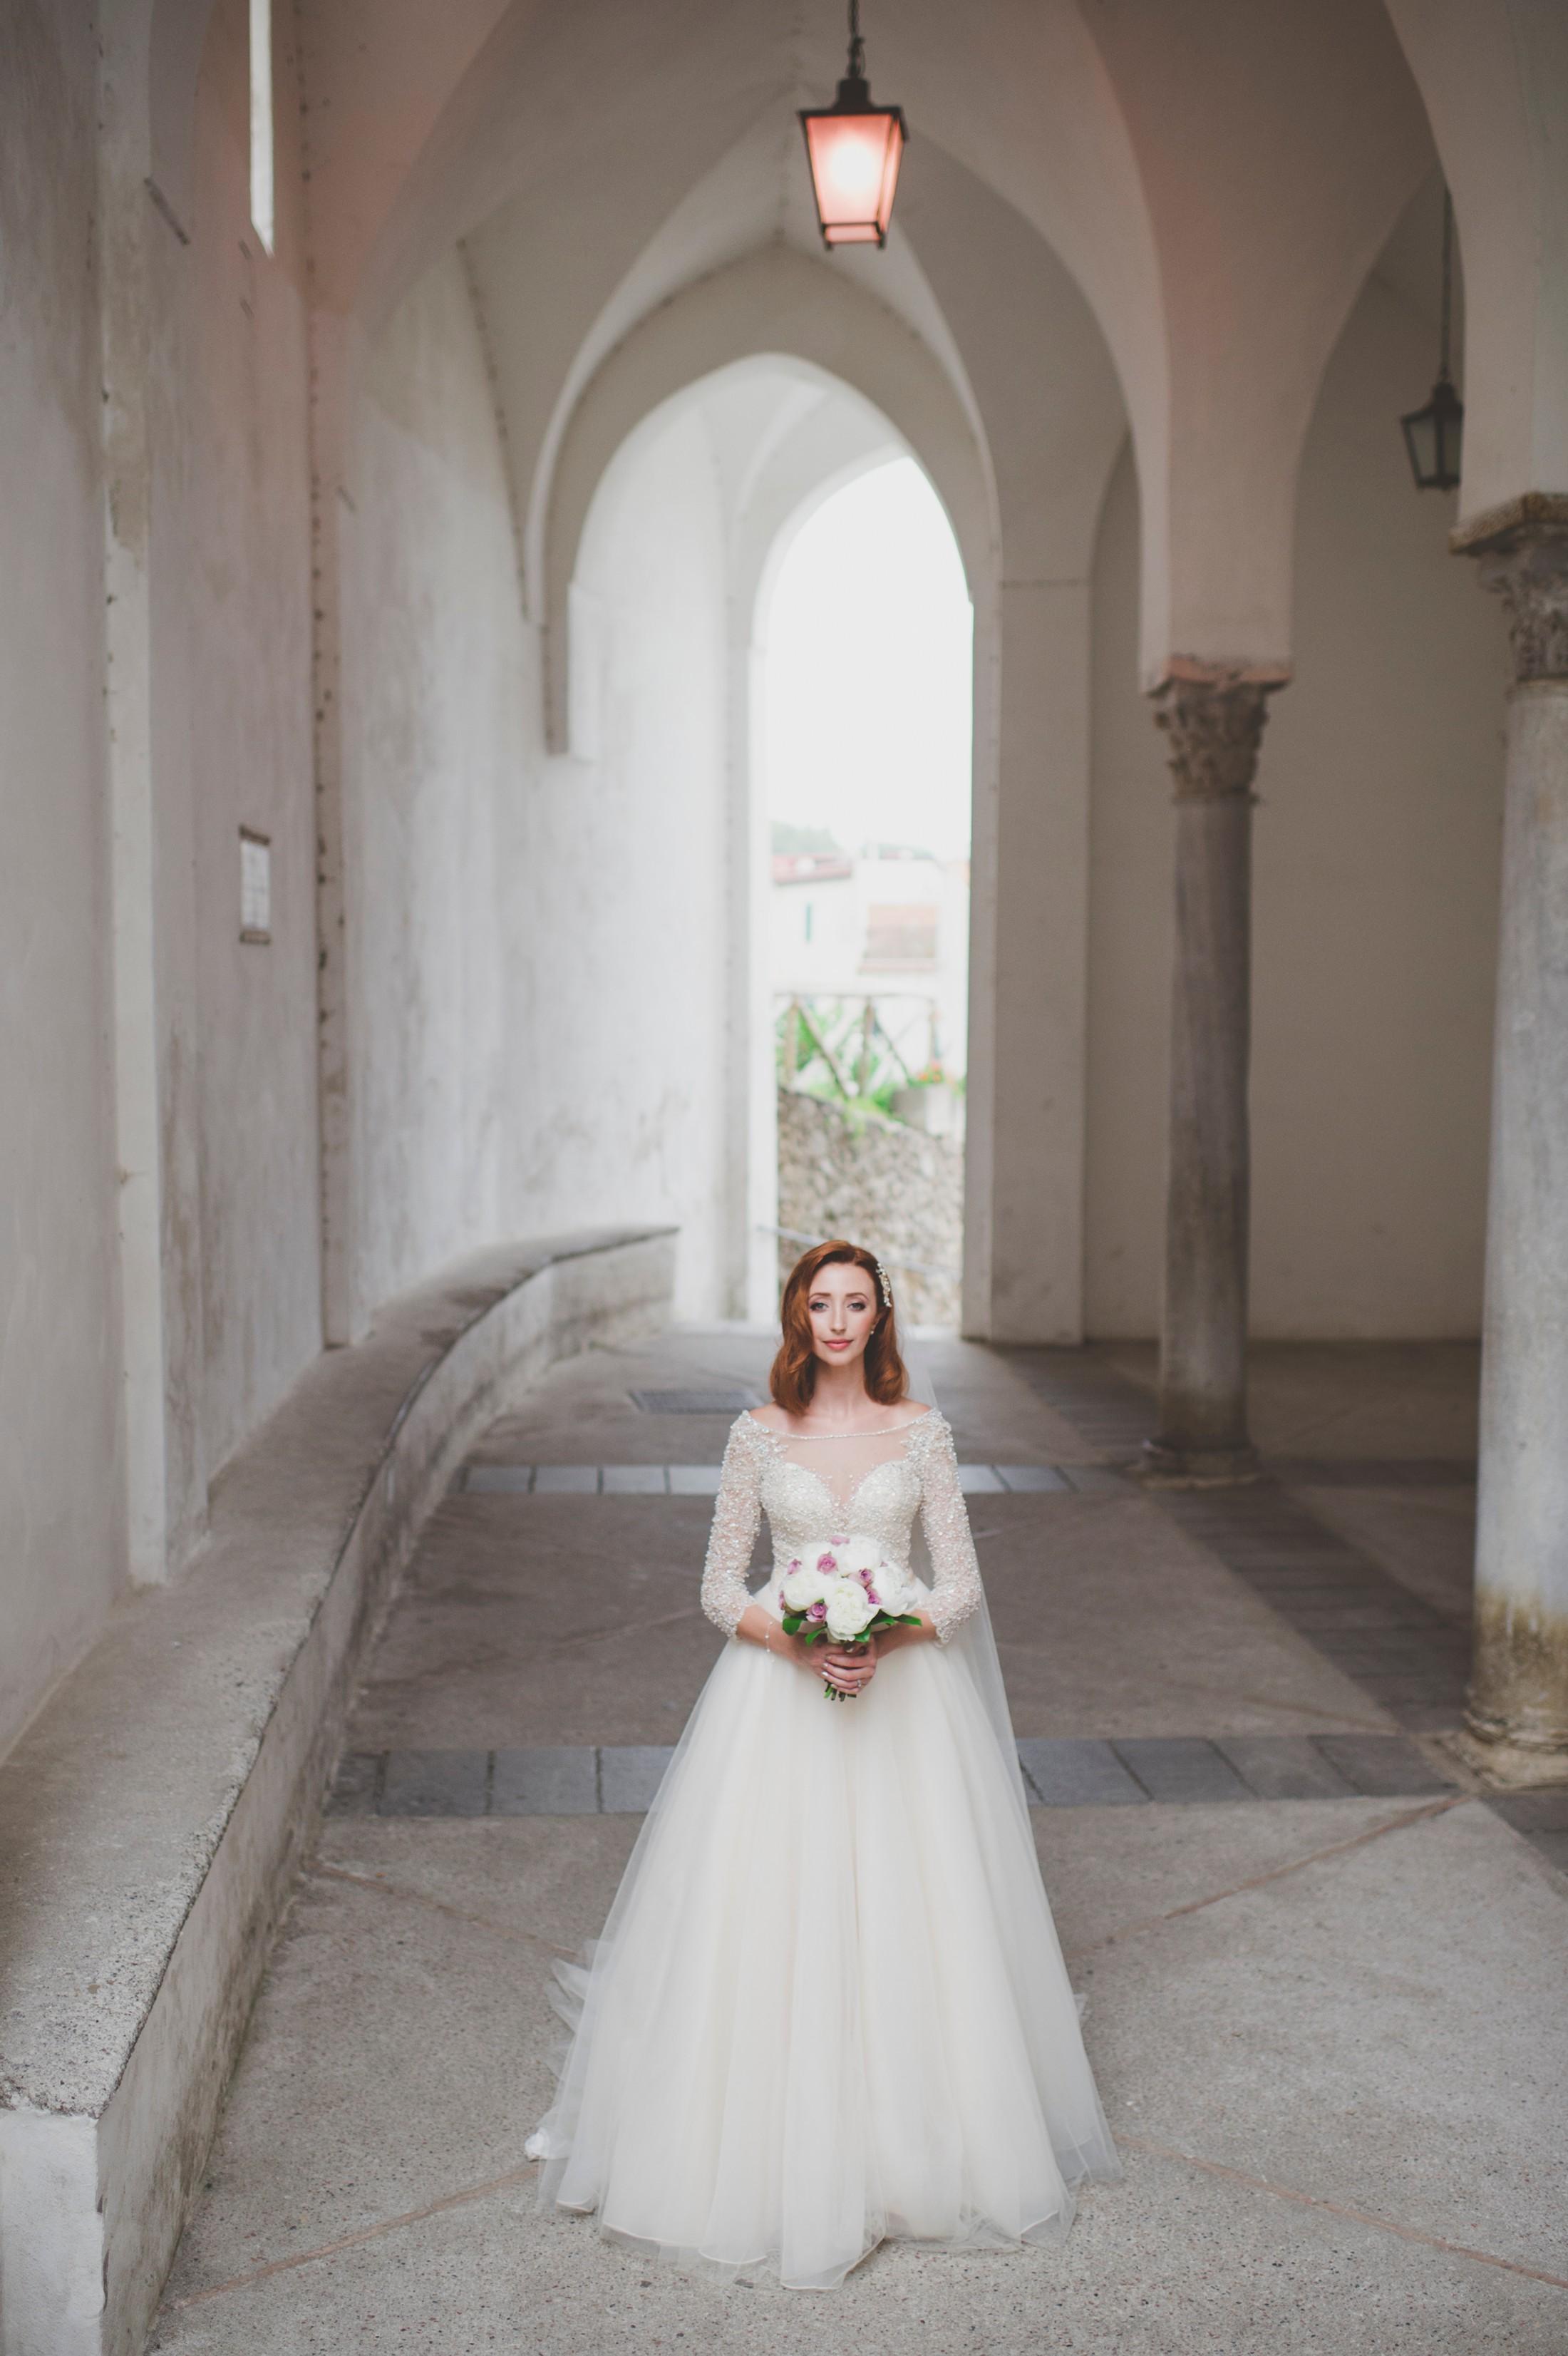 ravello wedding bride's portrait with her bouquet